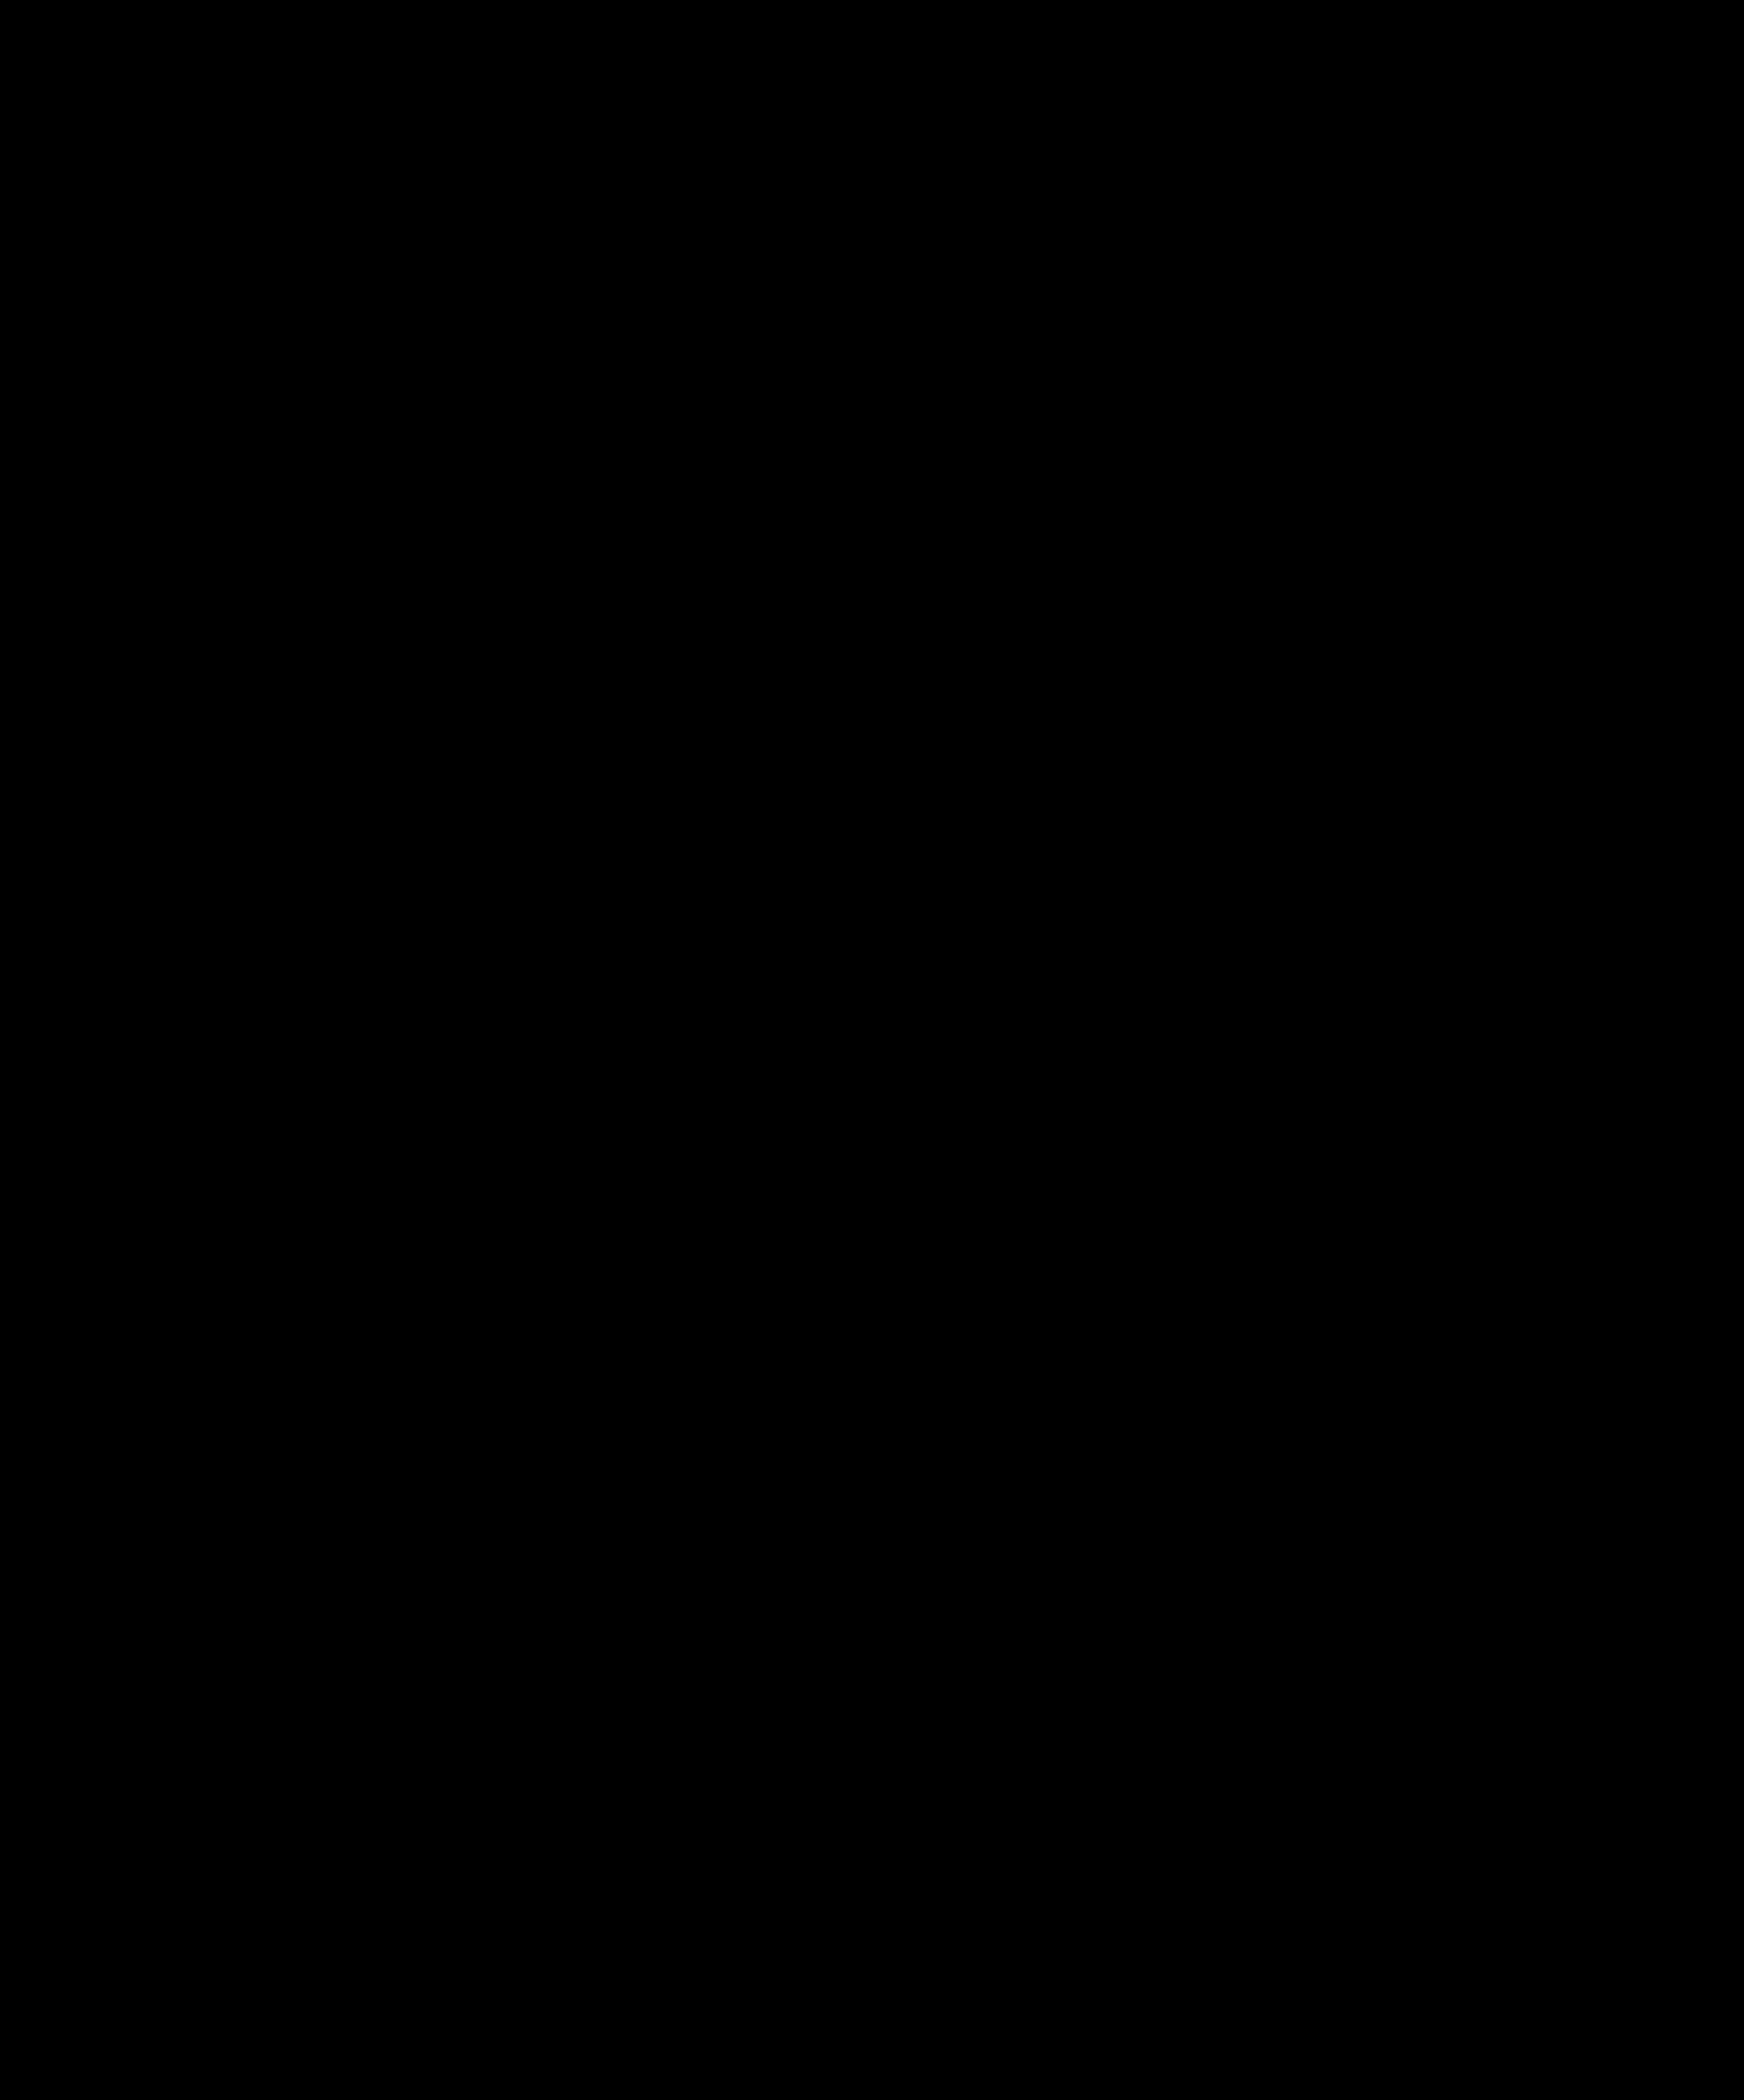 Hawking Bird Logo logo design by logo designer Olio Studio